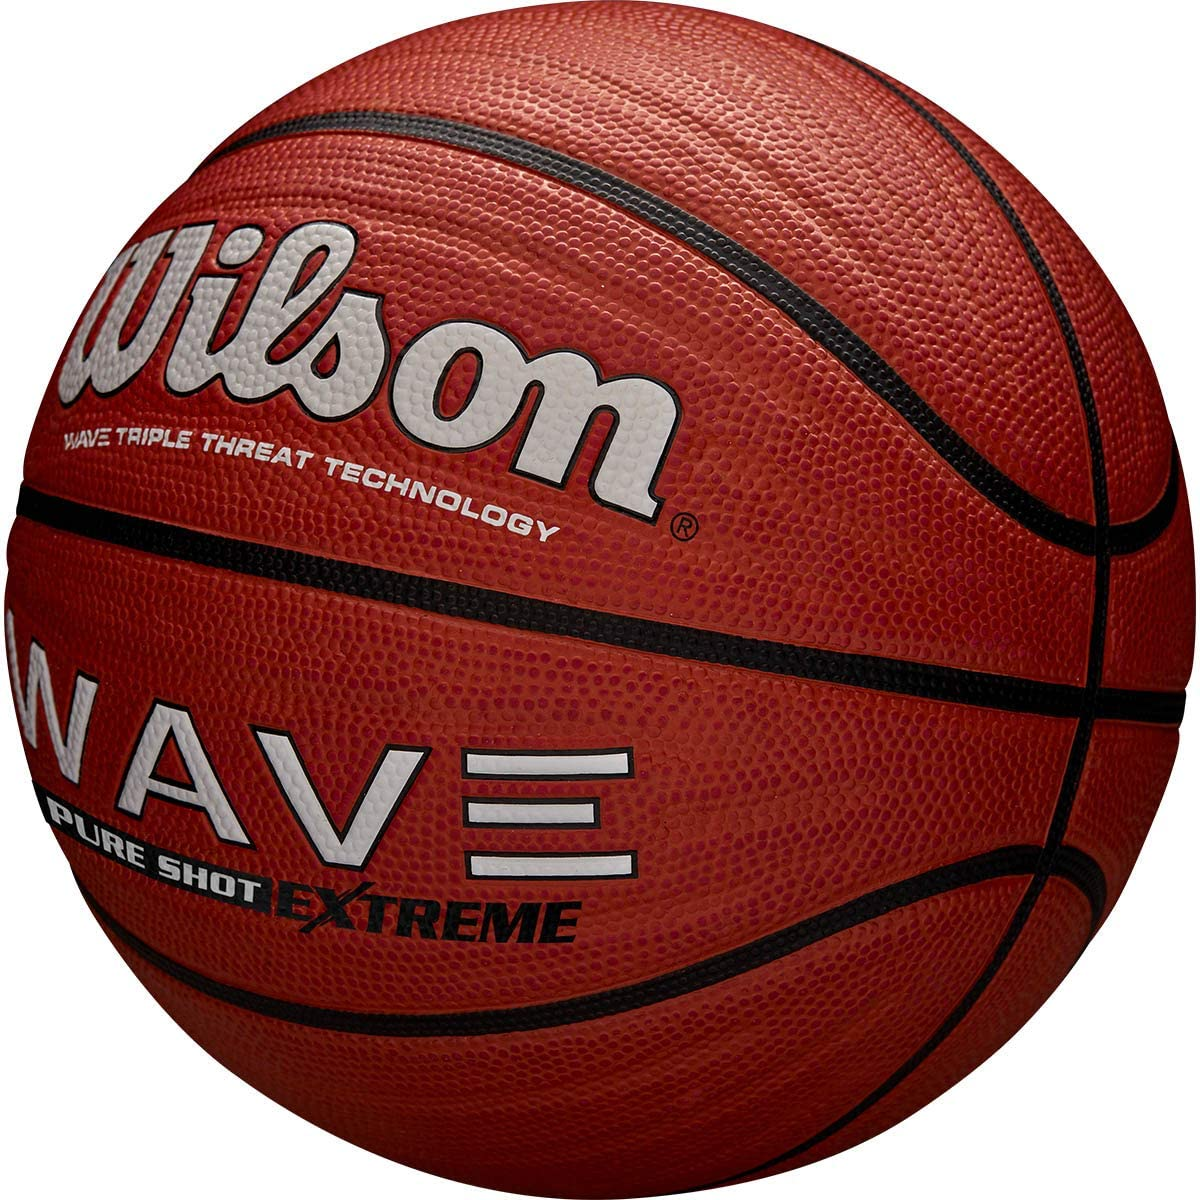 Wilson Wave Pure Shot Extreme Basketball